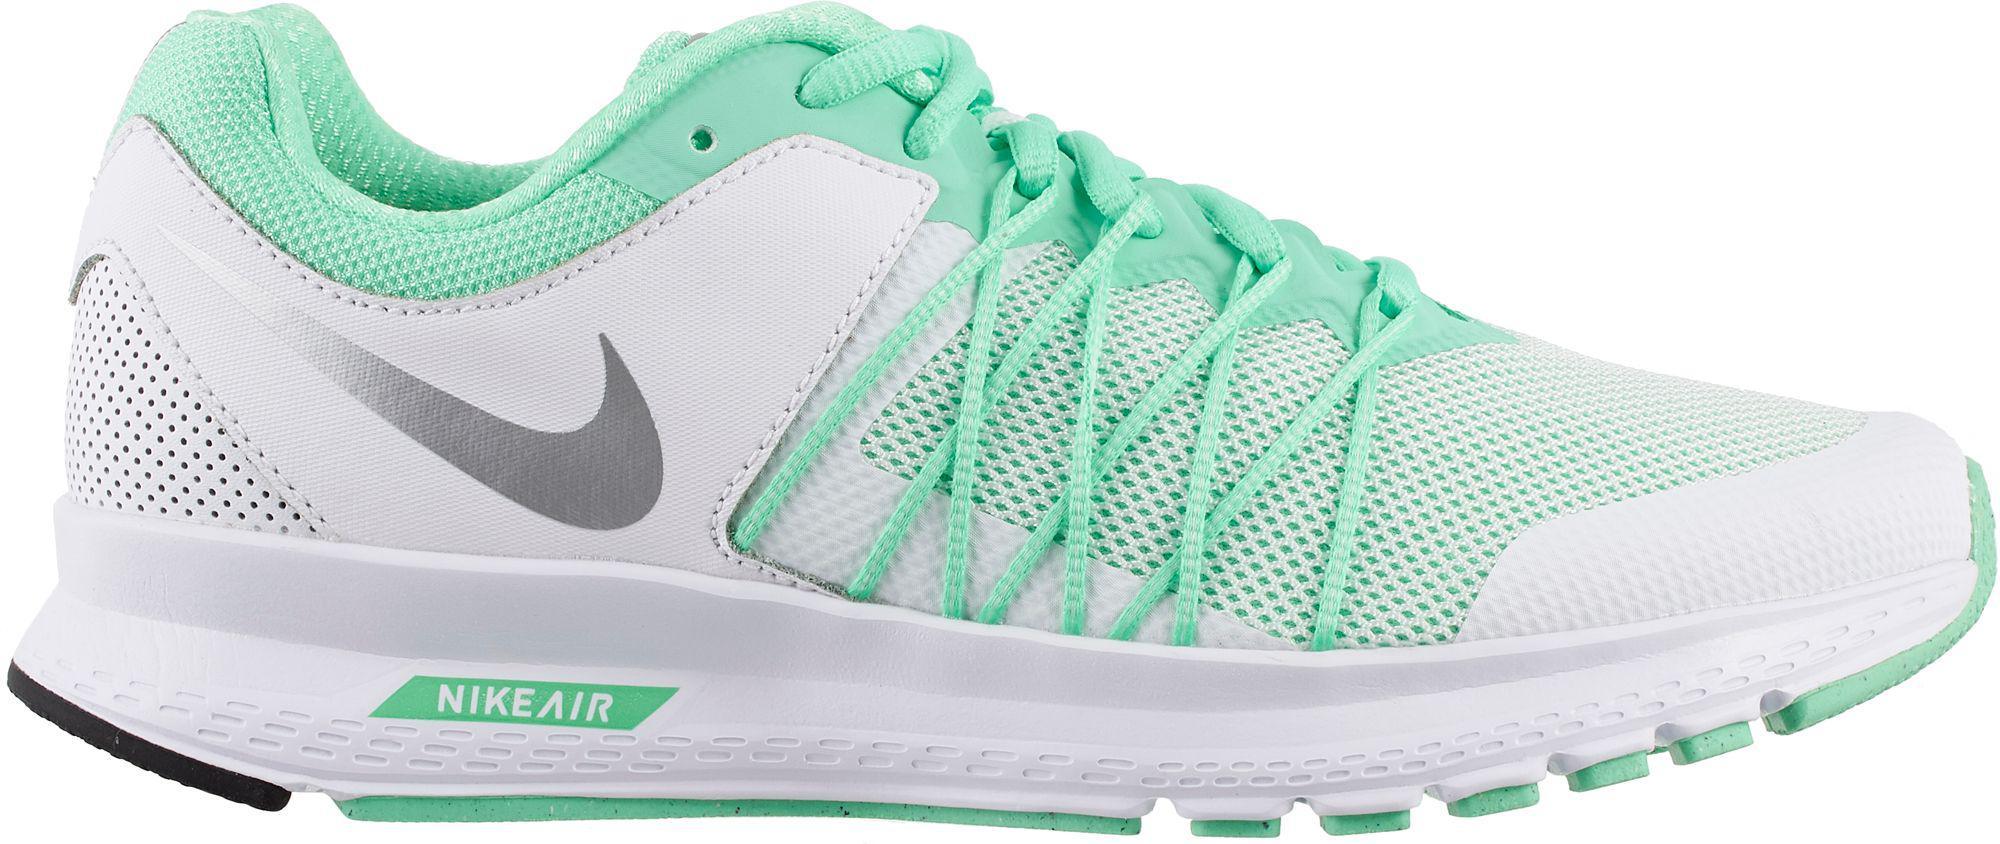 los angeles 1d4ff 3ccb1 Women's Green Air Relentless 6 Running Shoes